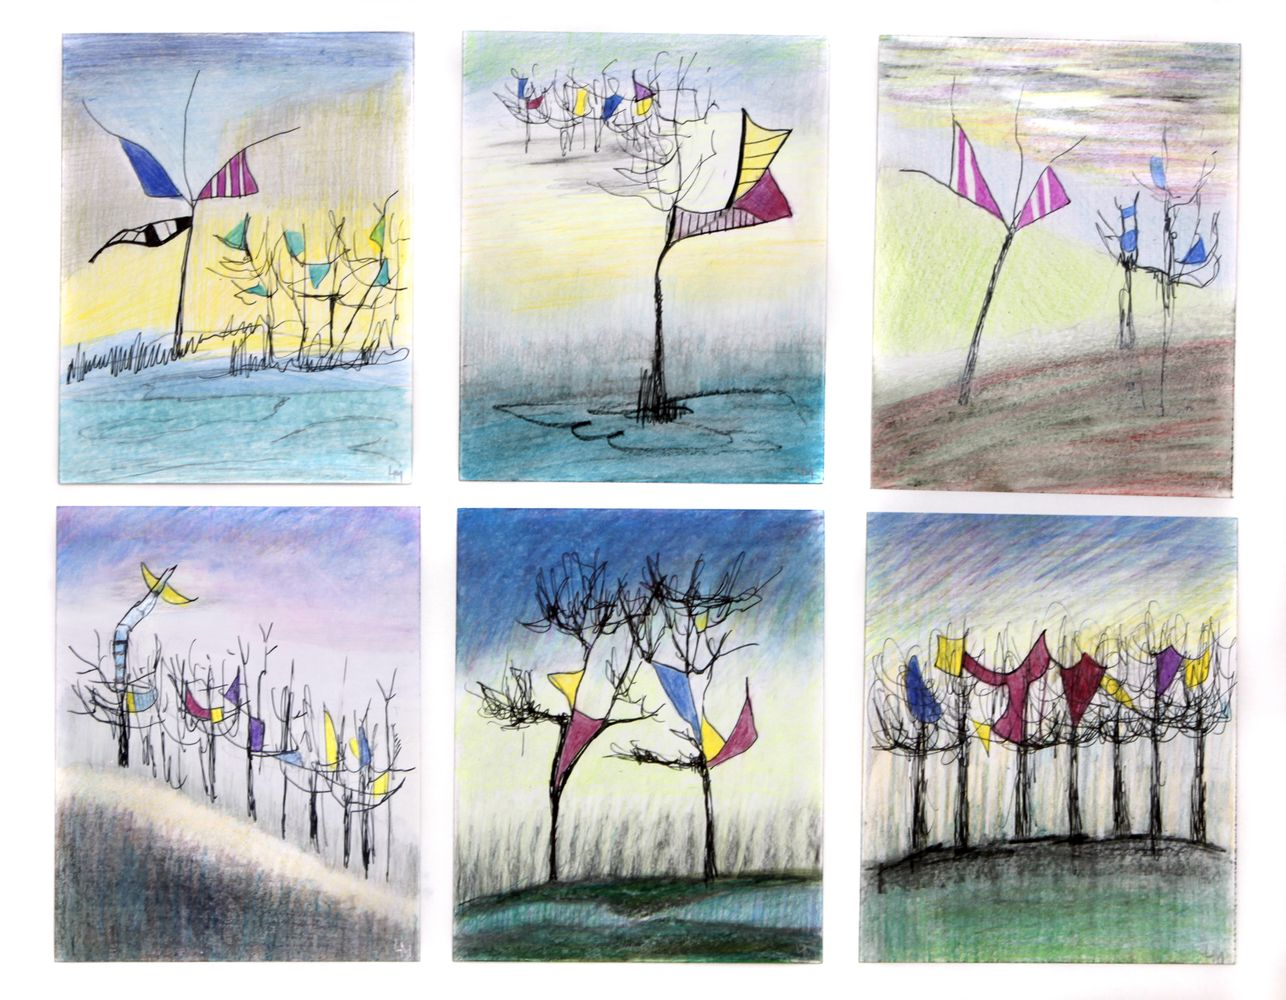 Lass den Bäumen Flügel wachsen, Buntstift, je 16 x 13,5 cm - gerahmt 50 x 60 cm